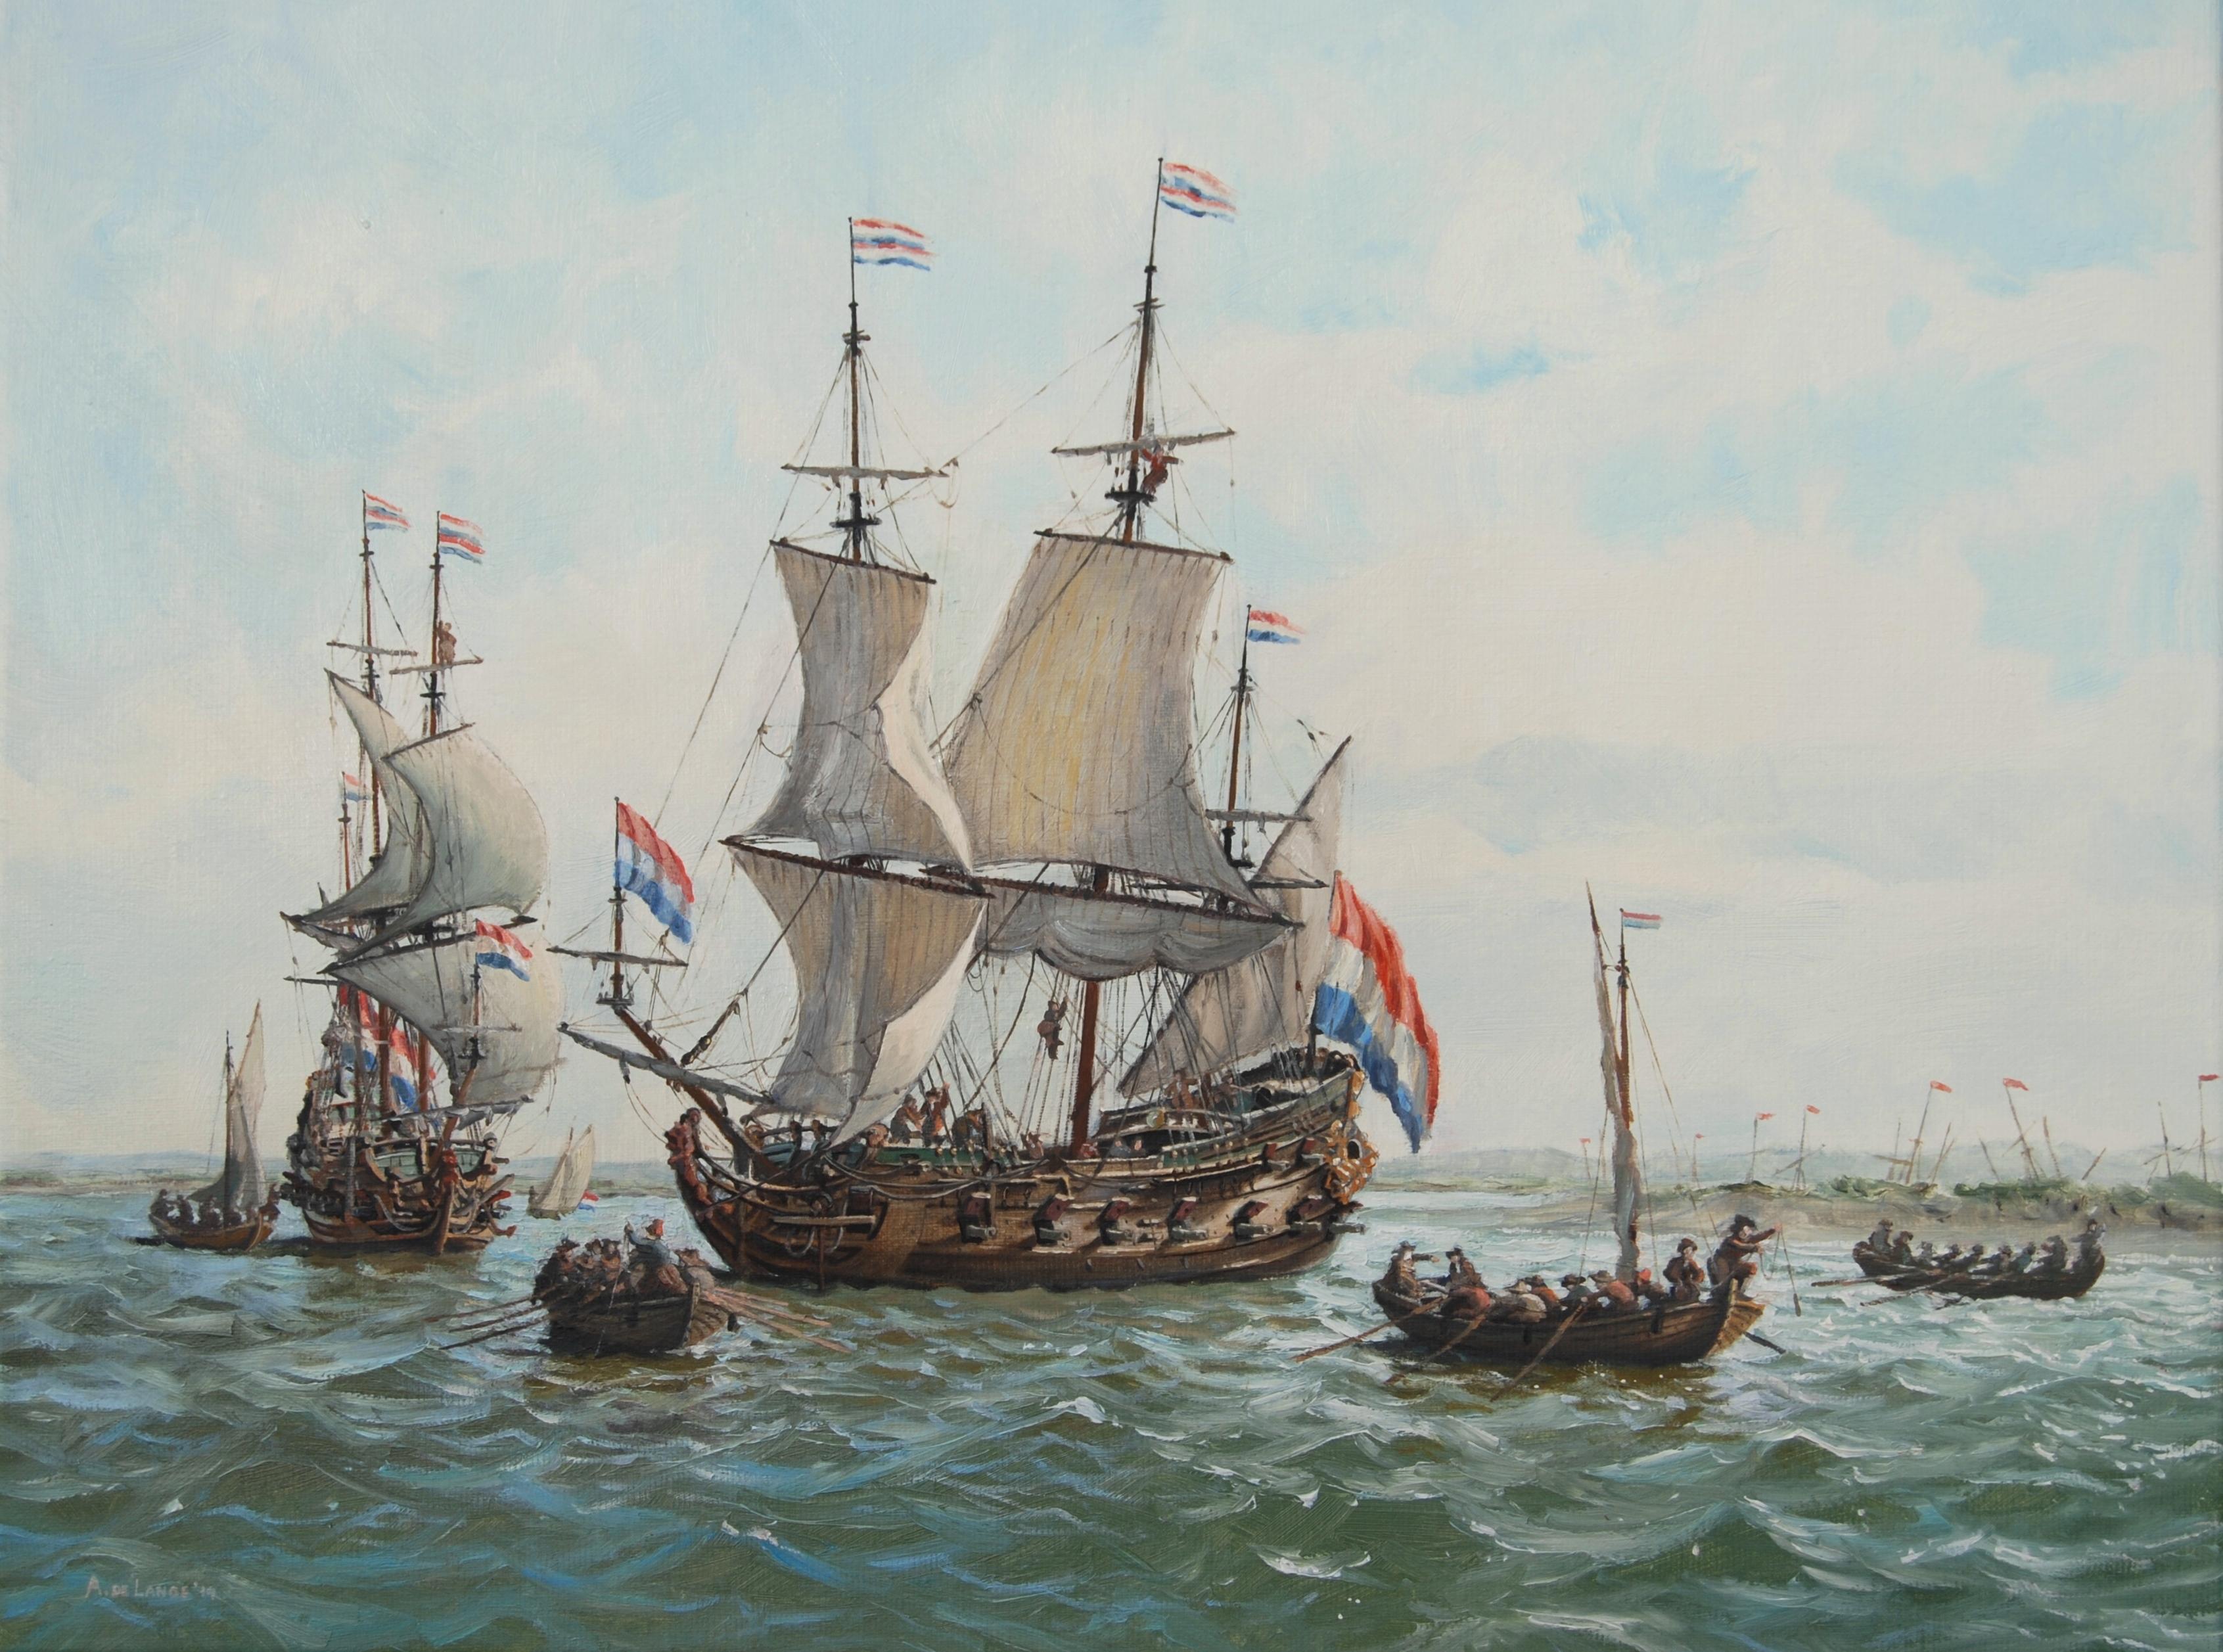 De tocht naar chatham maritiem schilder arnold de lange for The chatham